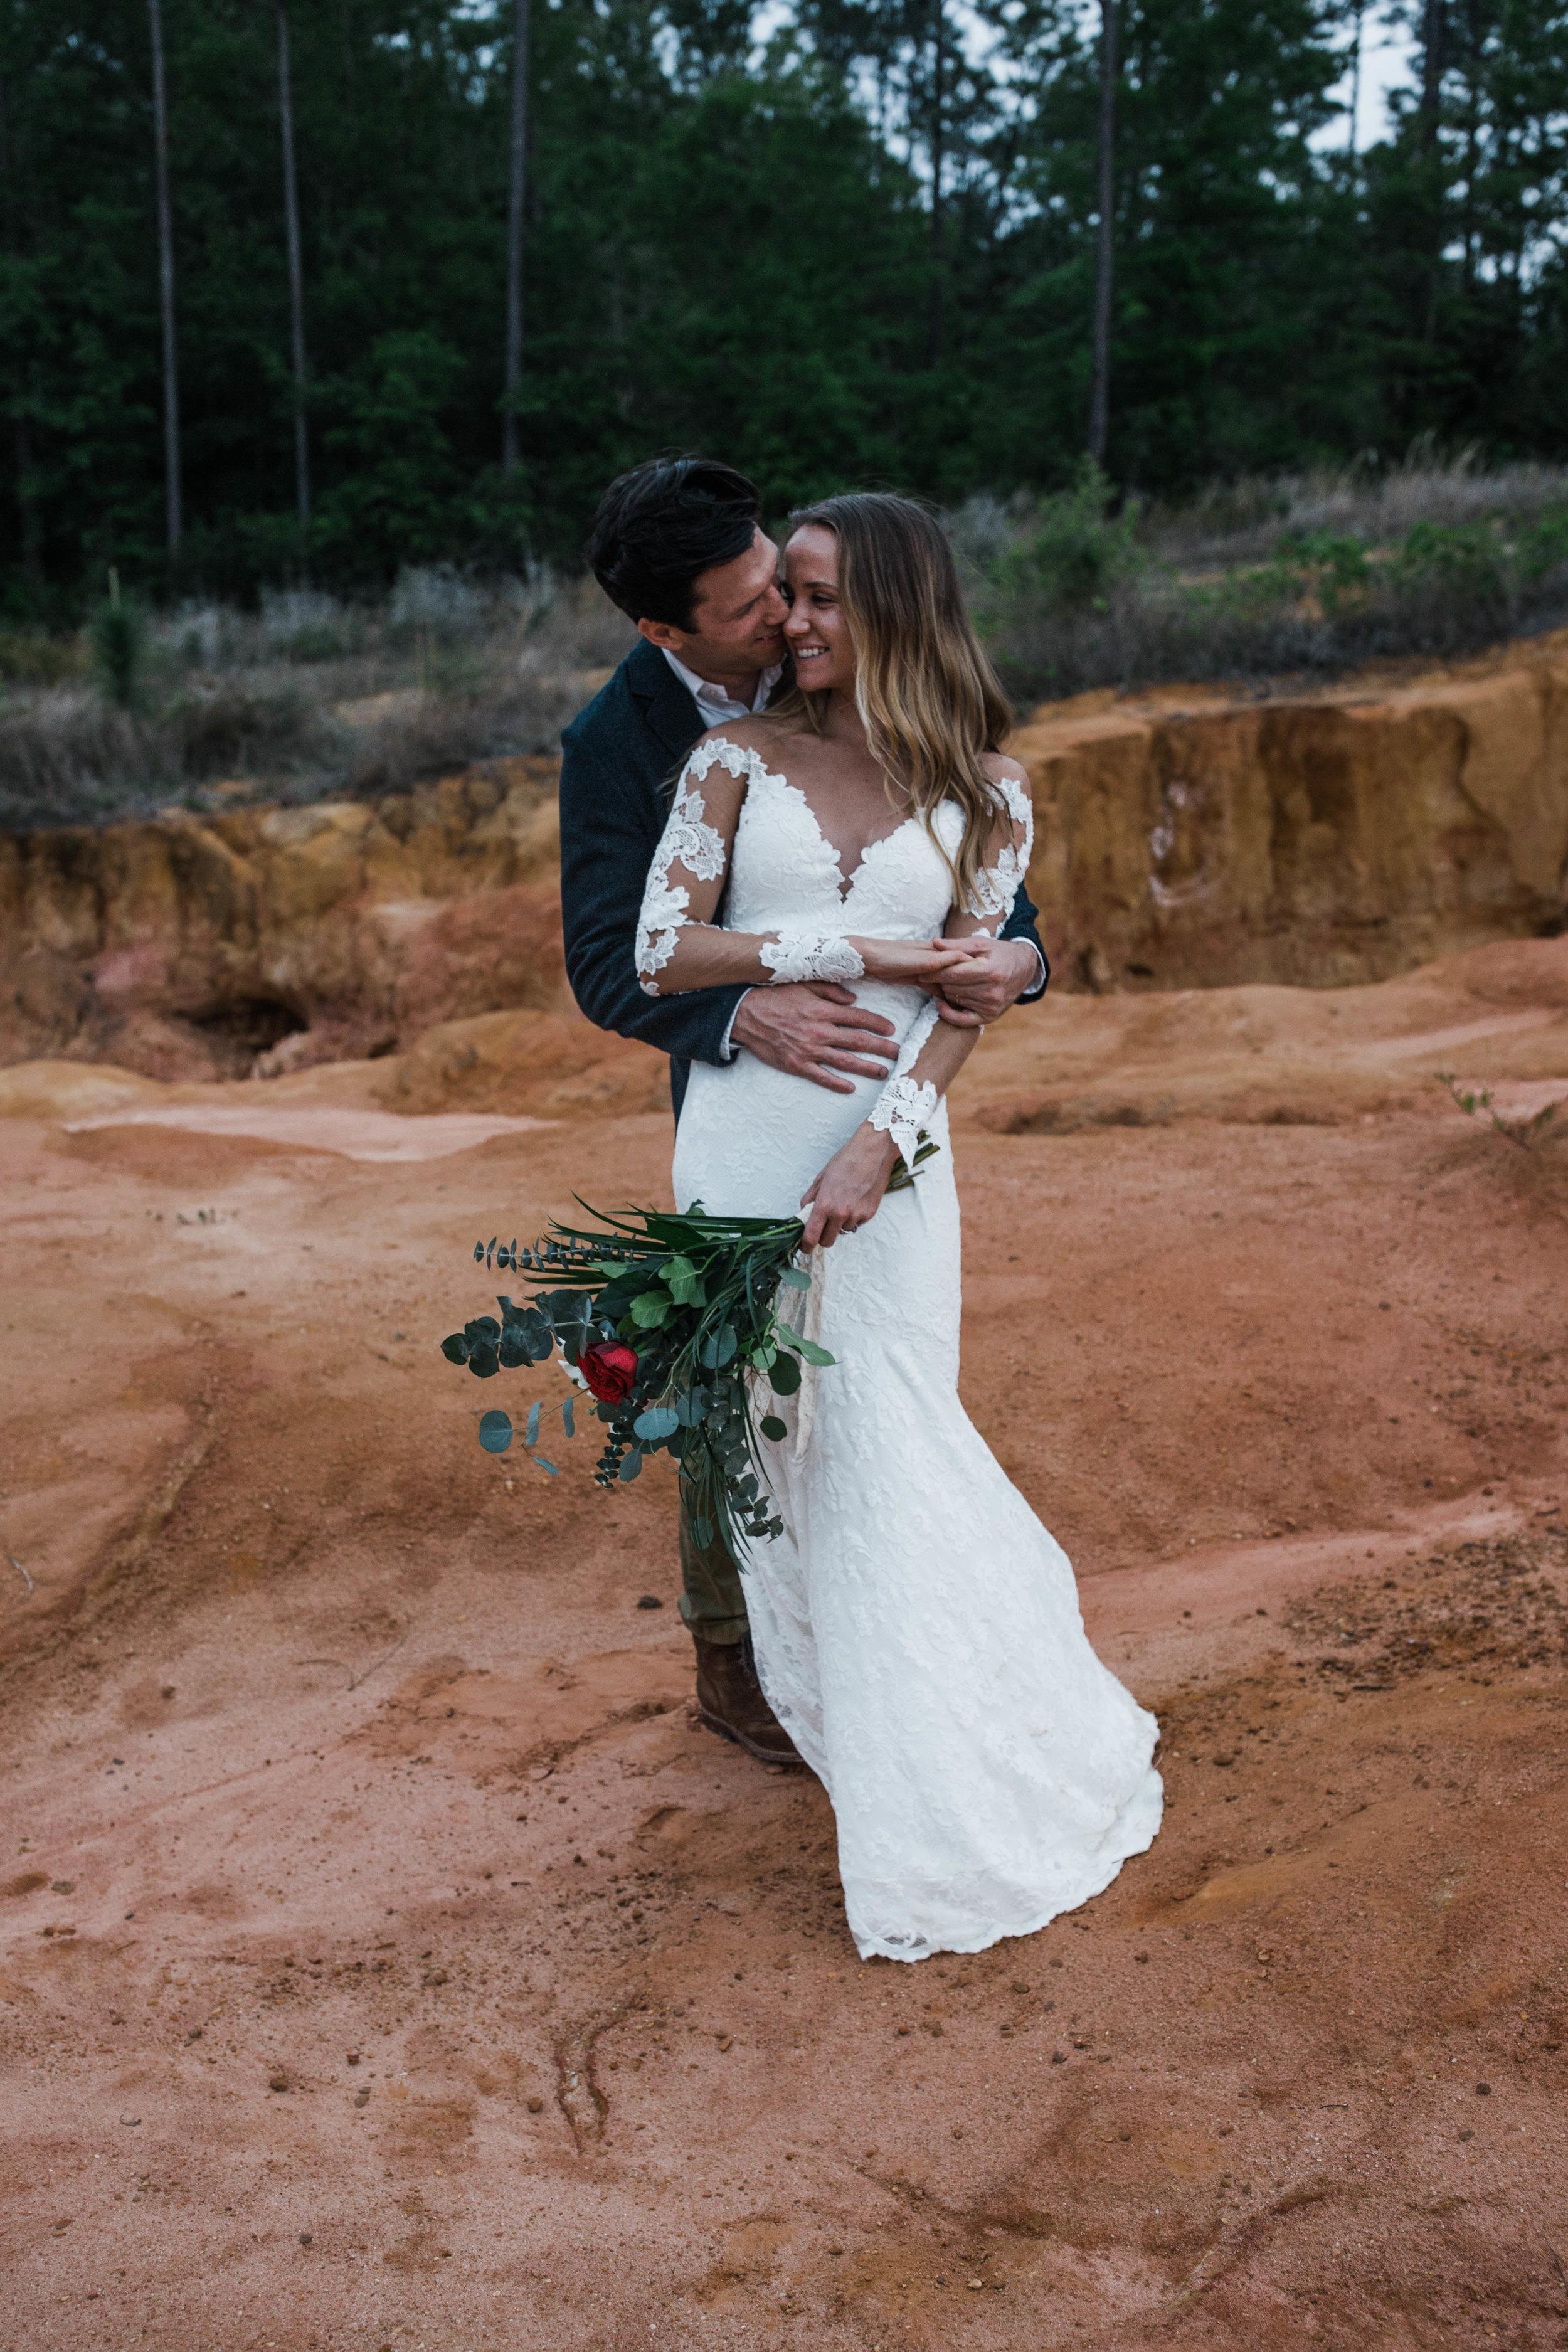 Adventure wedding + elopement photographer// @zoesteindl